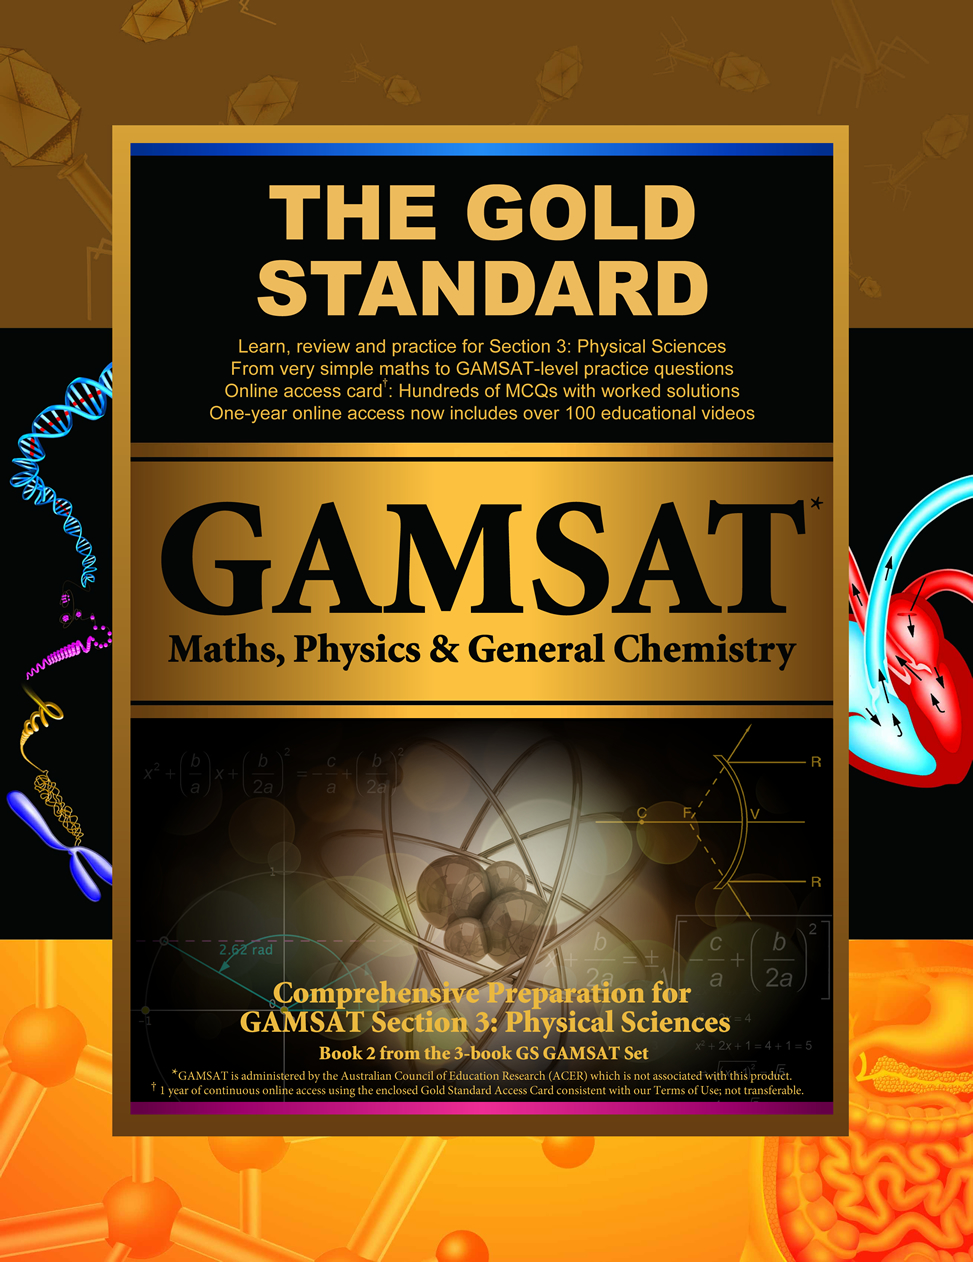 GAMSAT Courses and GAMSAT Preparation   Gold Standard GAMSAT